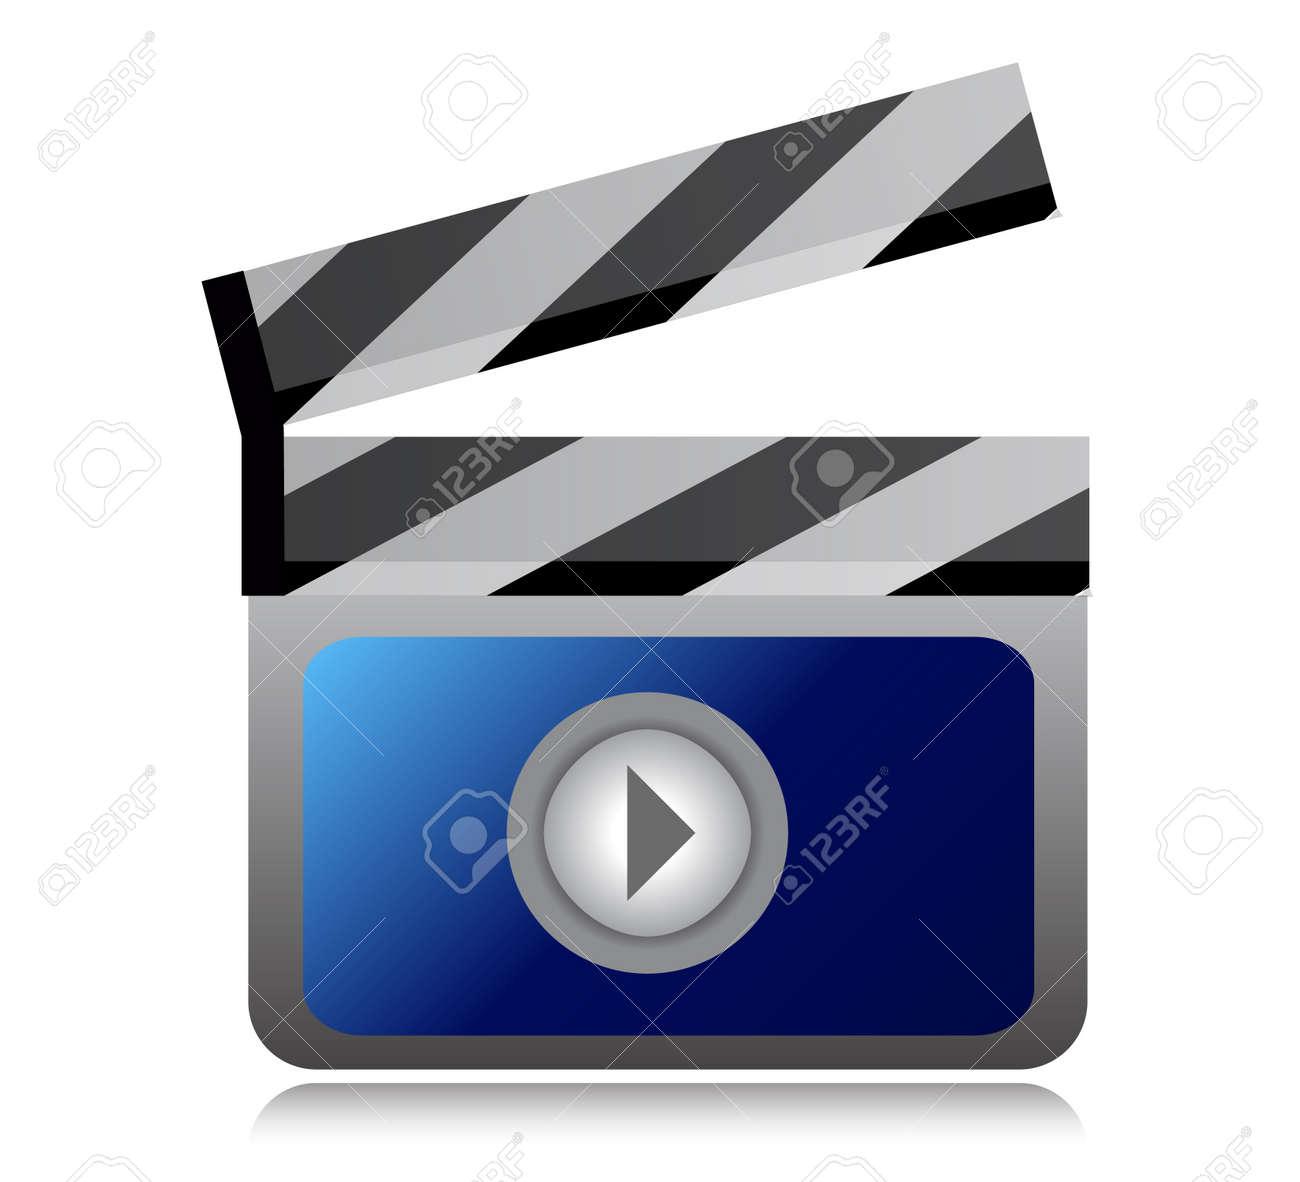 video movie clipper illustration design over a  white background Stock Vector - 15113512